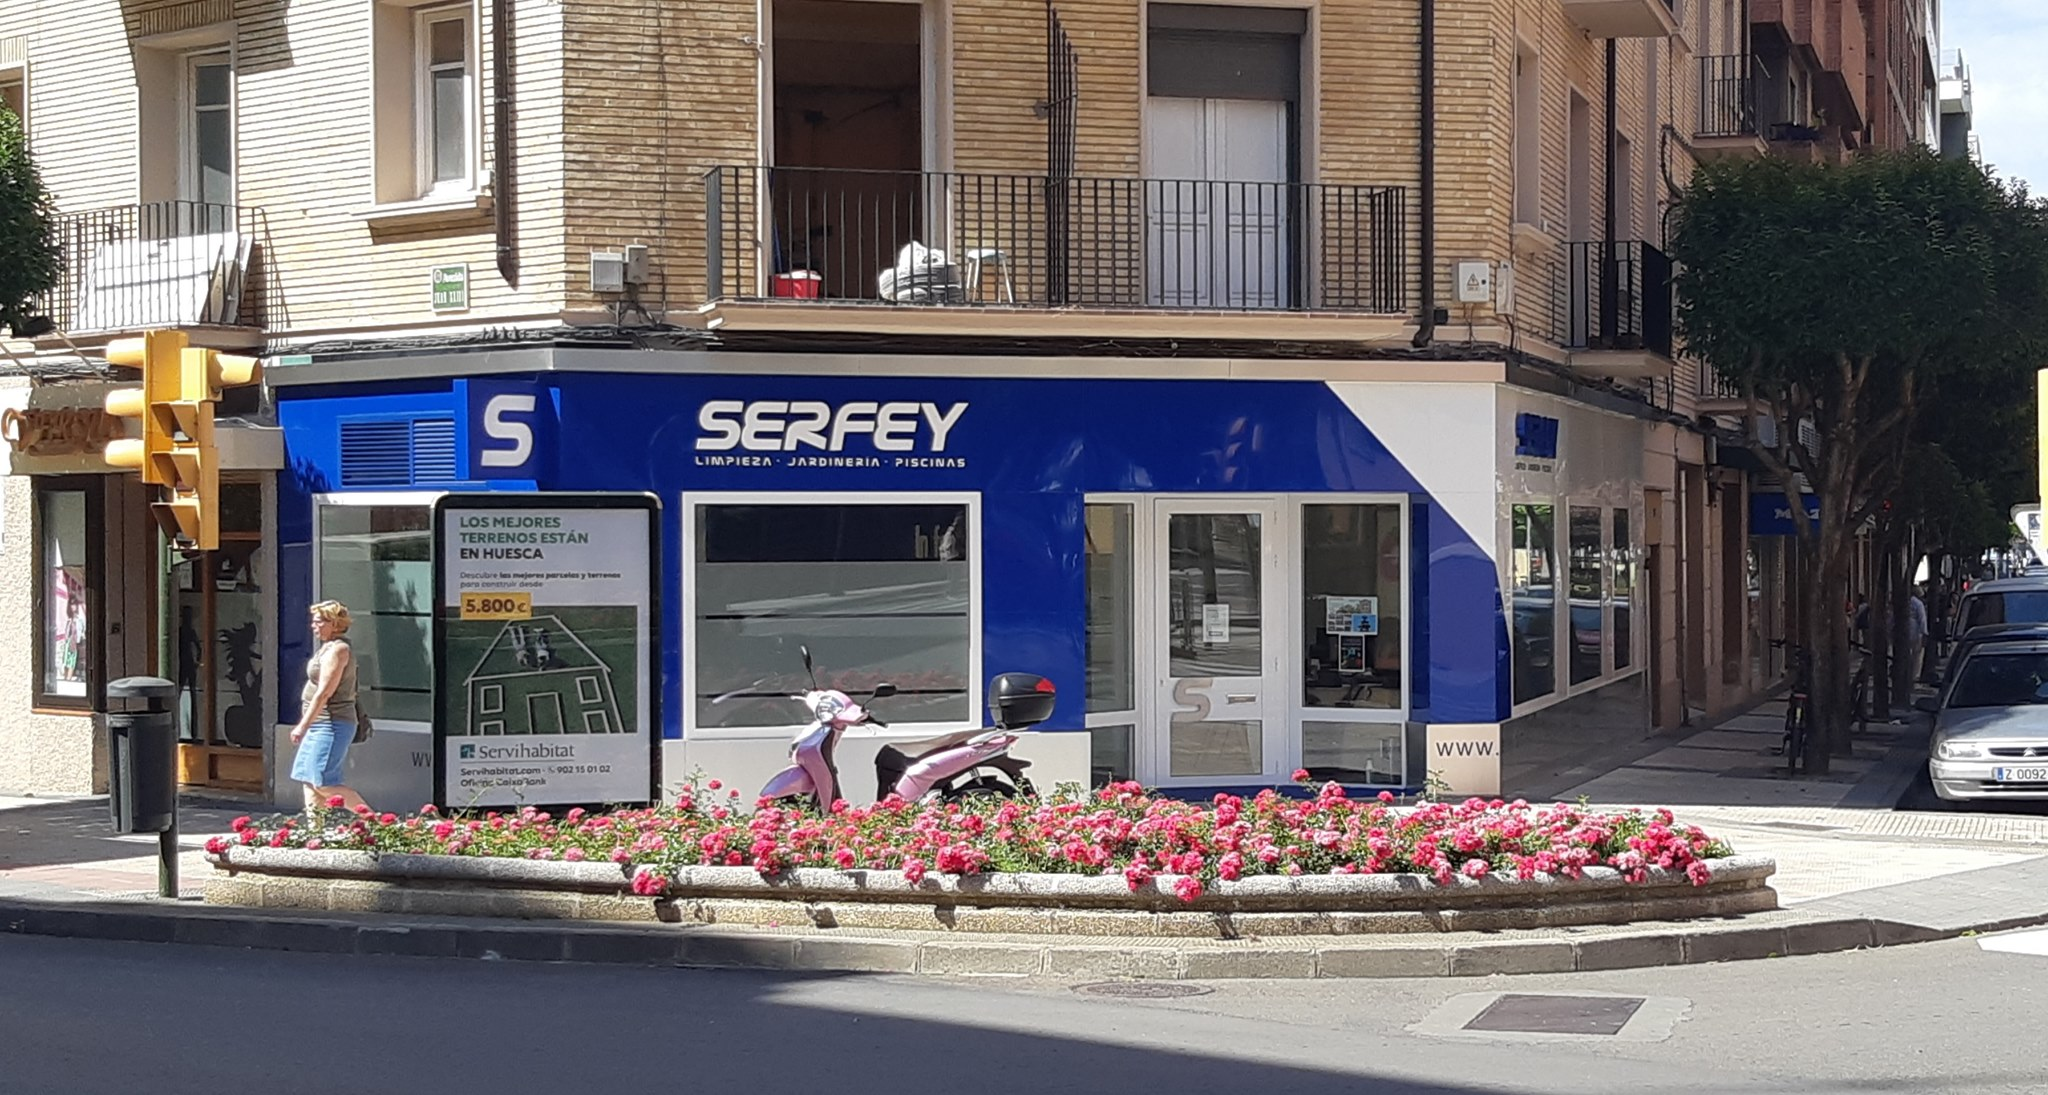 SERFEY SE SUMA A LA LUCHA CONTRA EL CORONAVIRUS